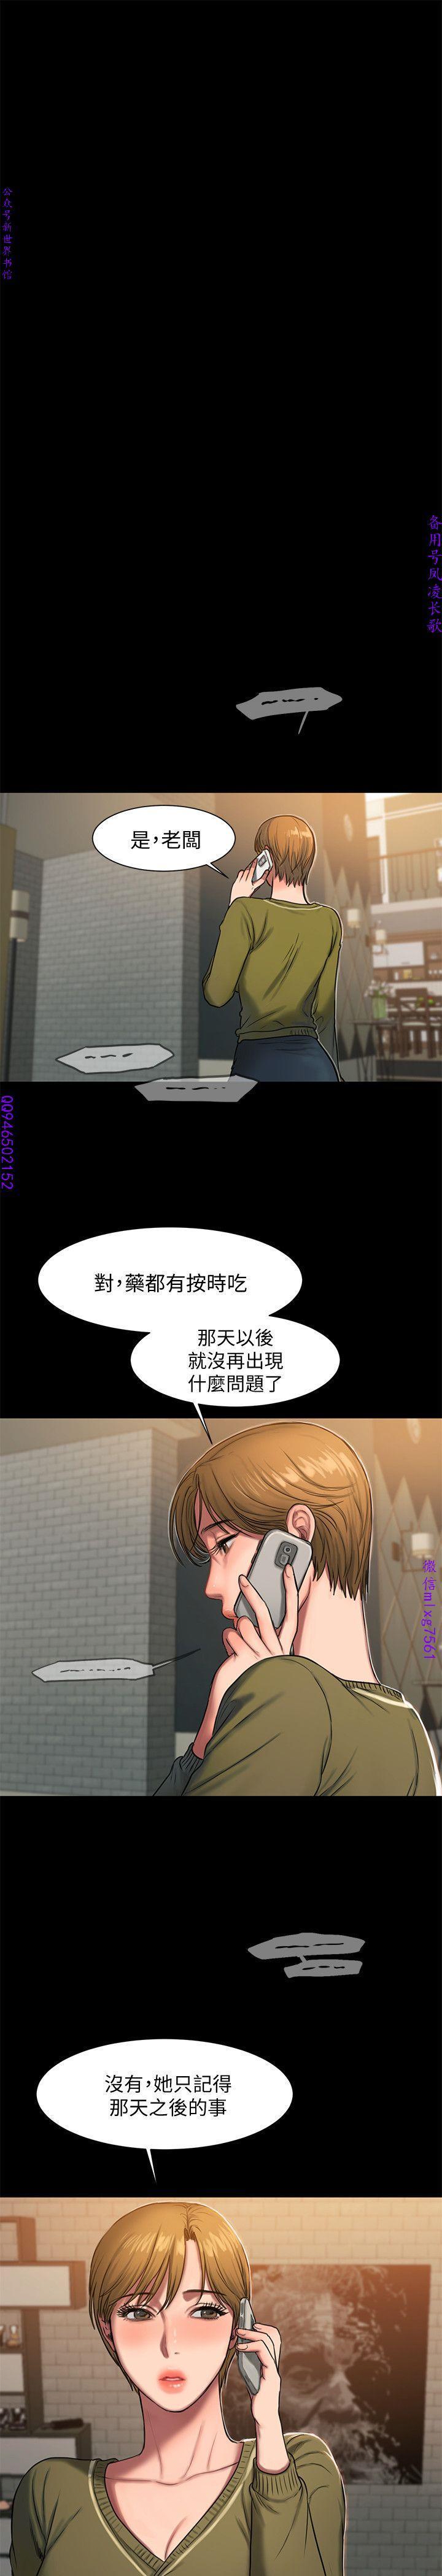 Run away 1-10【中文】 199